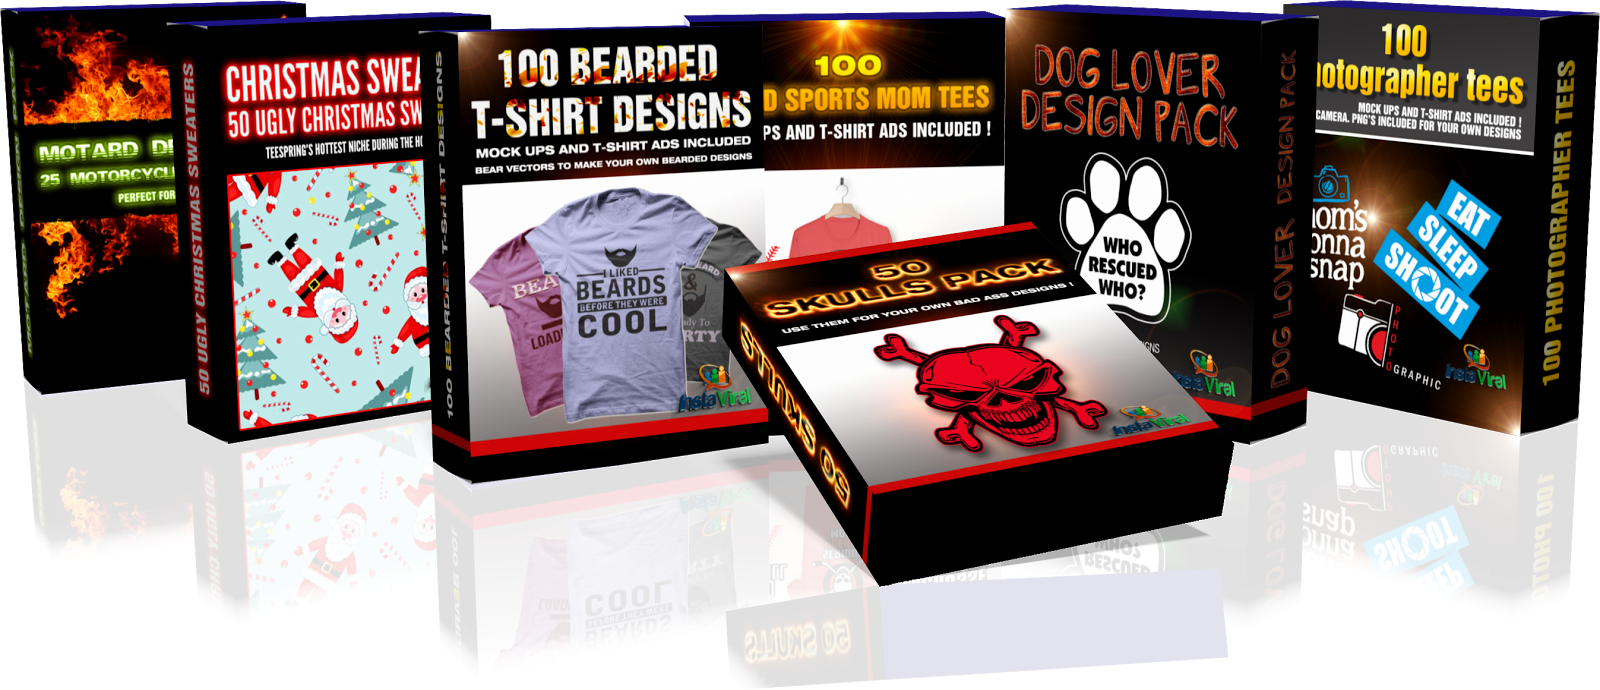 graffixpro studio t-shirt design software torrent